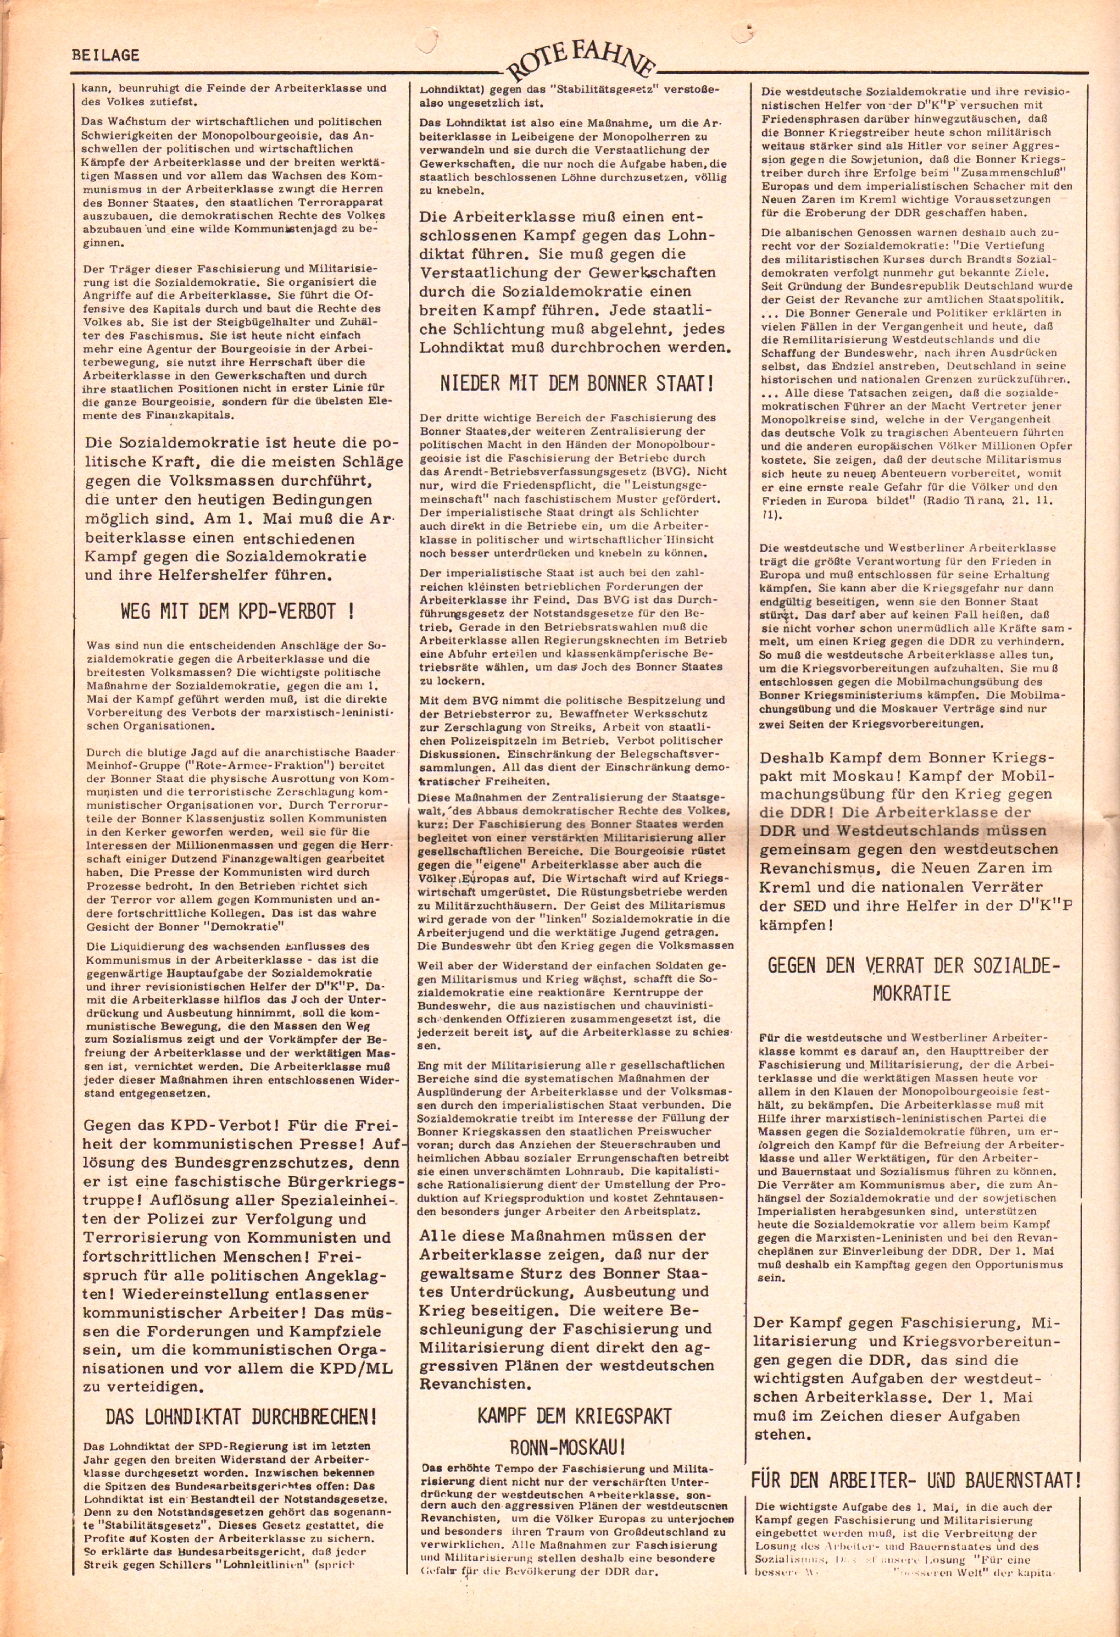 Rote Fahne, 3. Jg., 20.3.1972, Nr. 6, Beilage, Seite 2